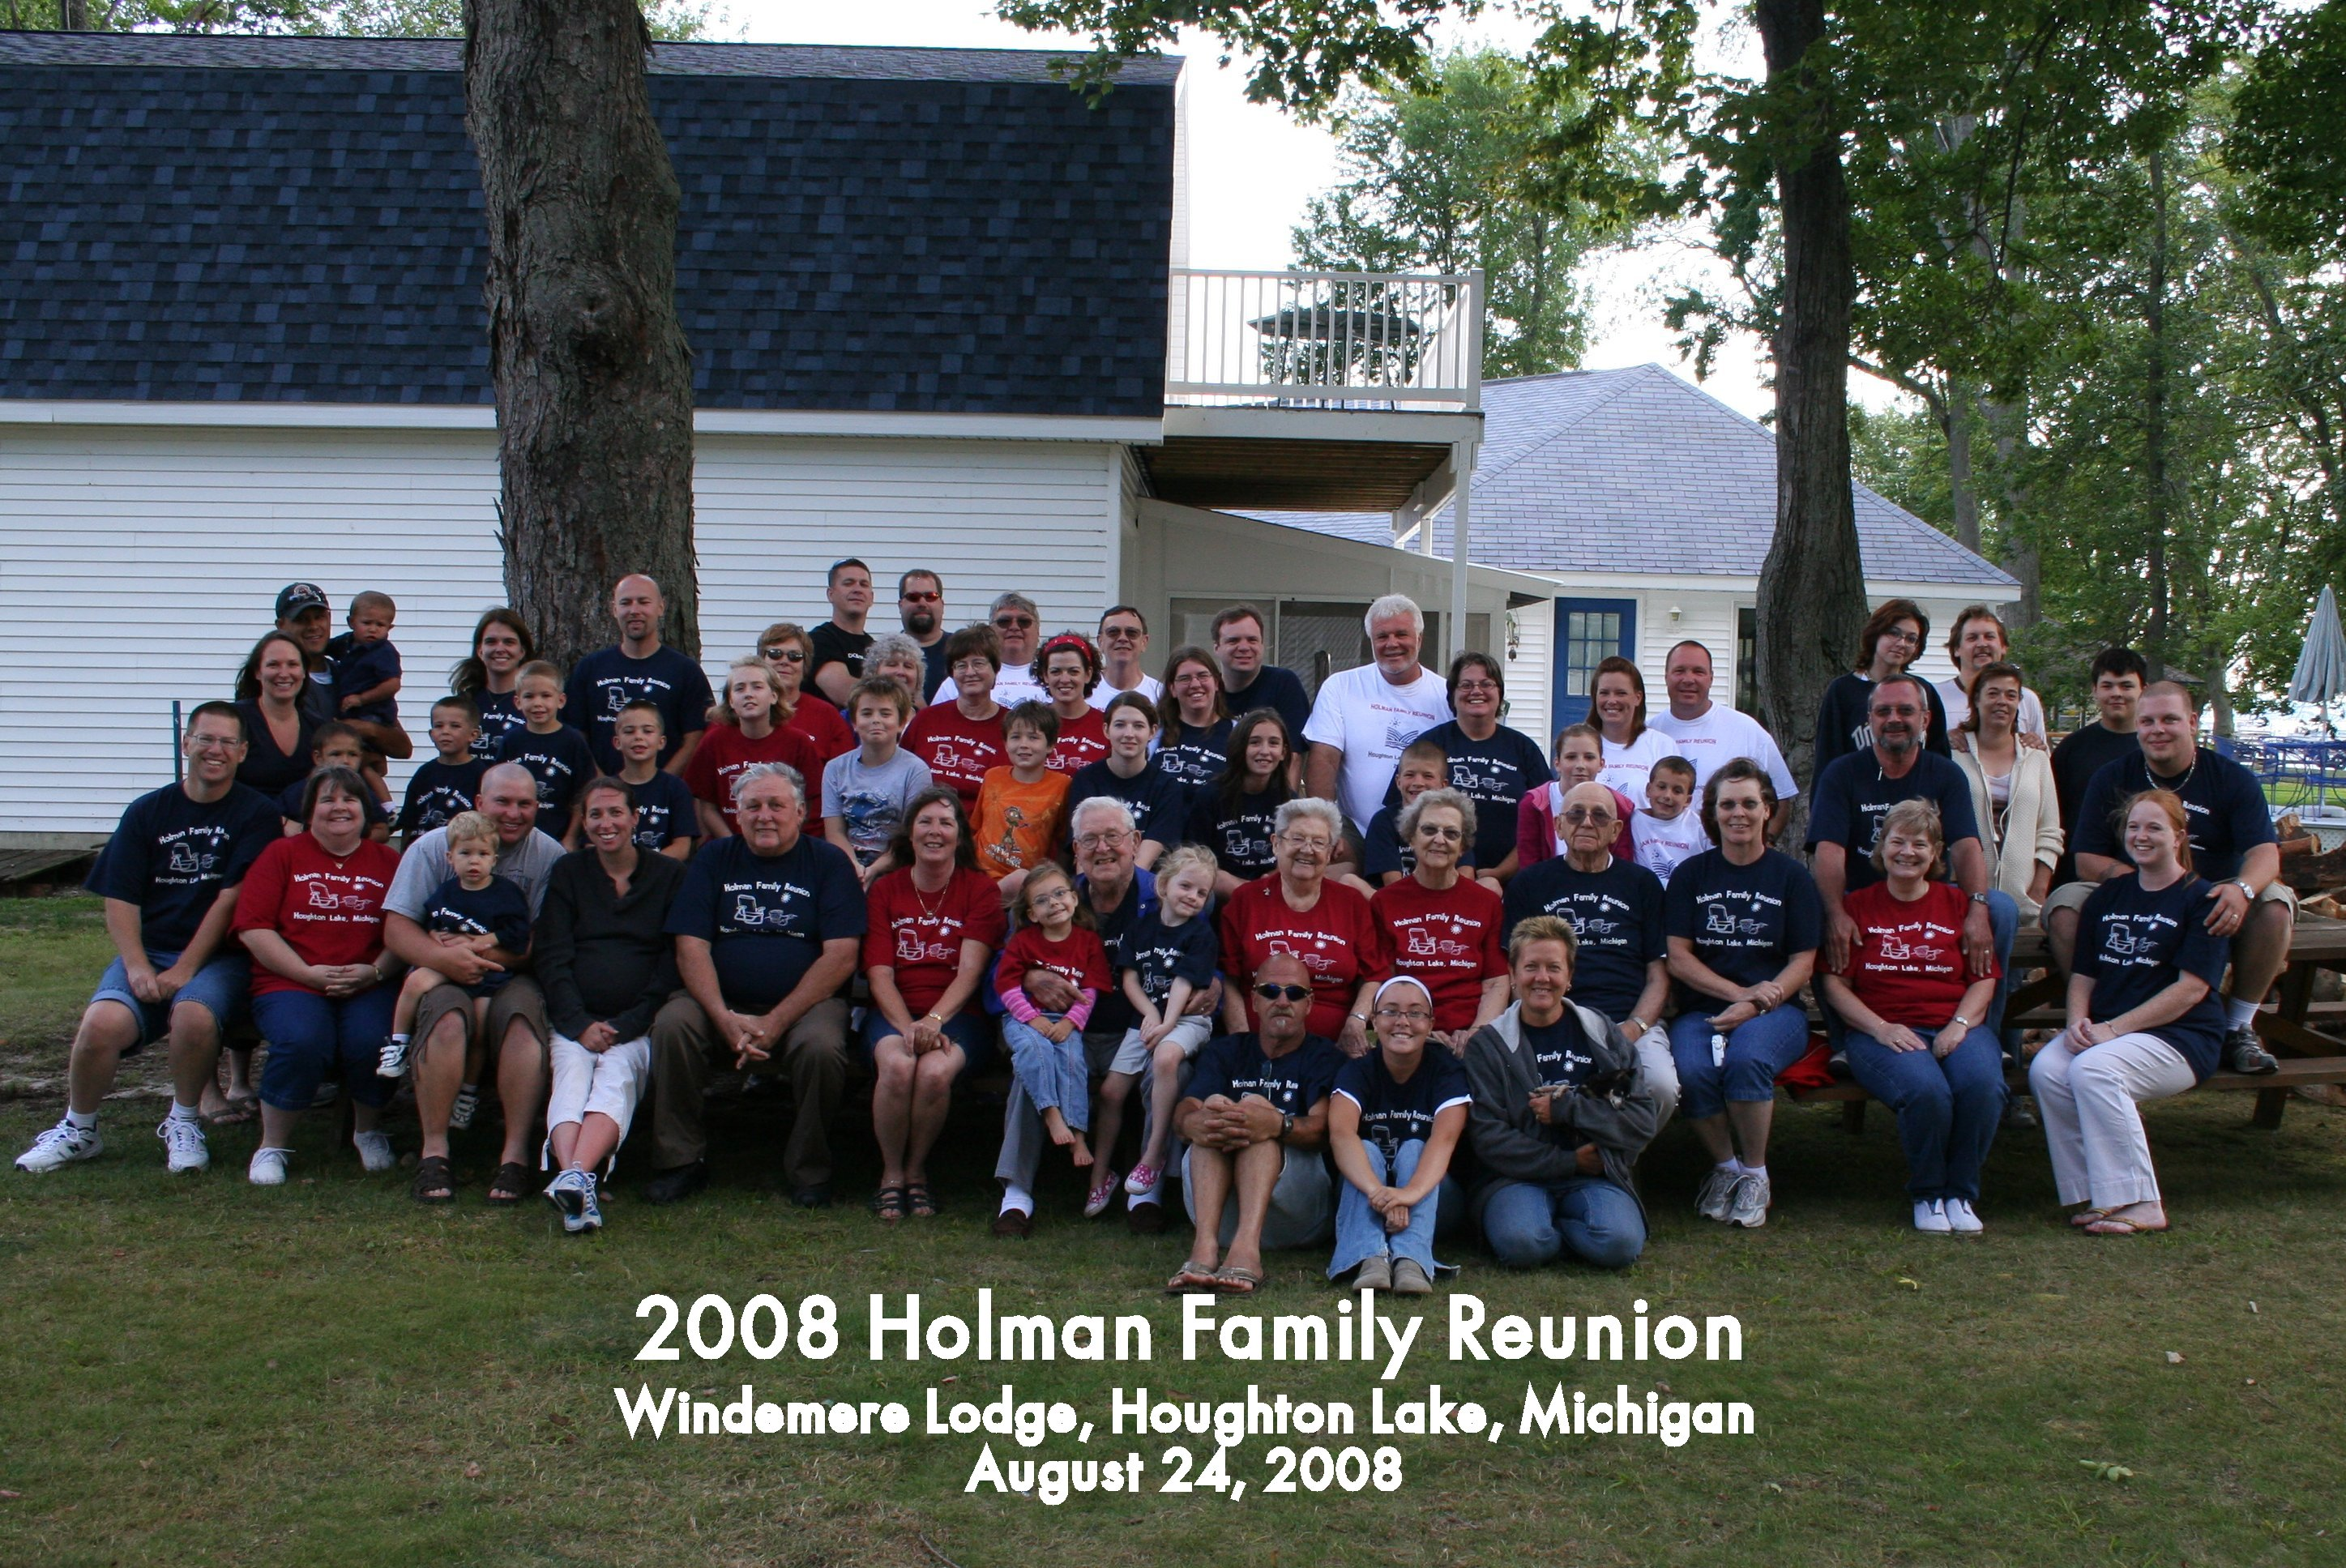 Custom t shirts for 2008 holman family reunion shirt for Custom t shirts for family reunion